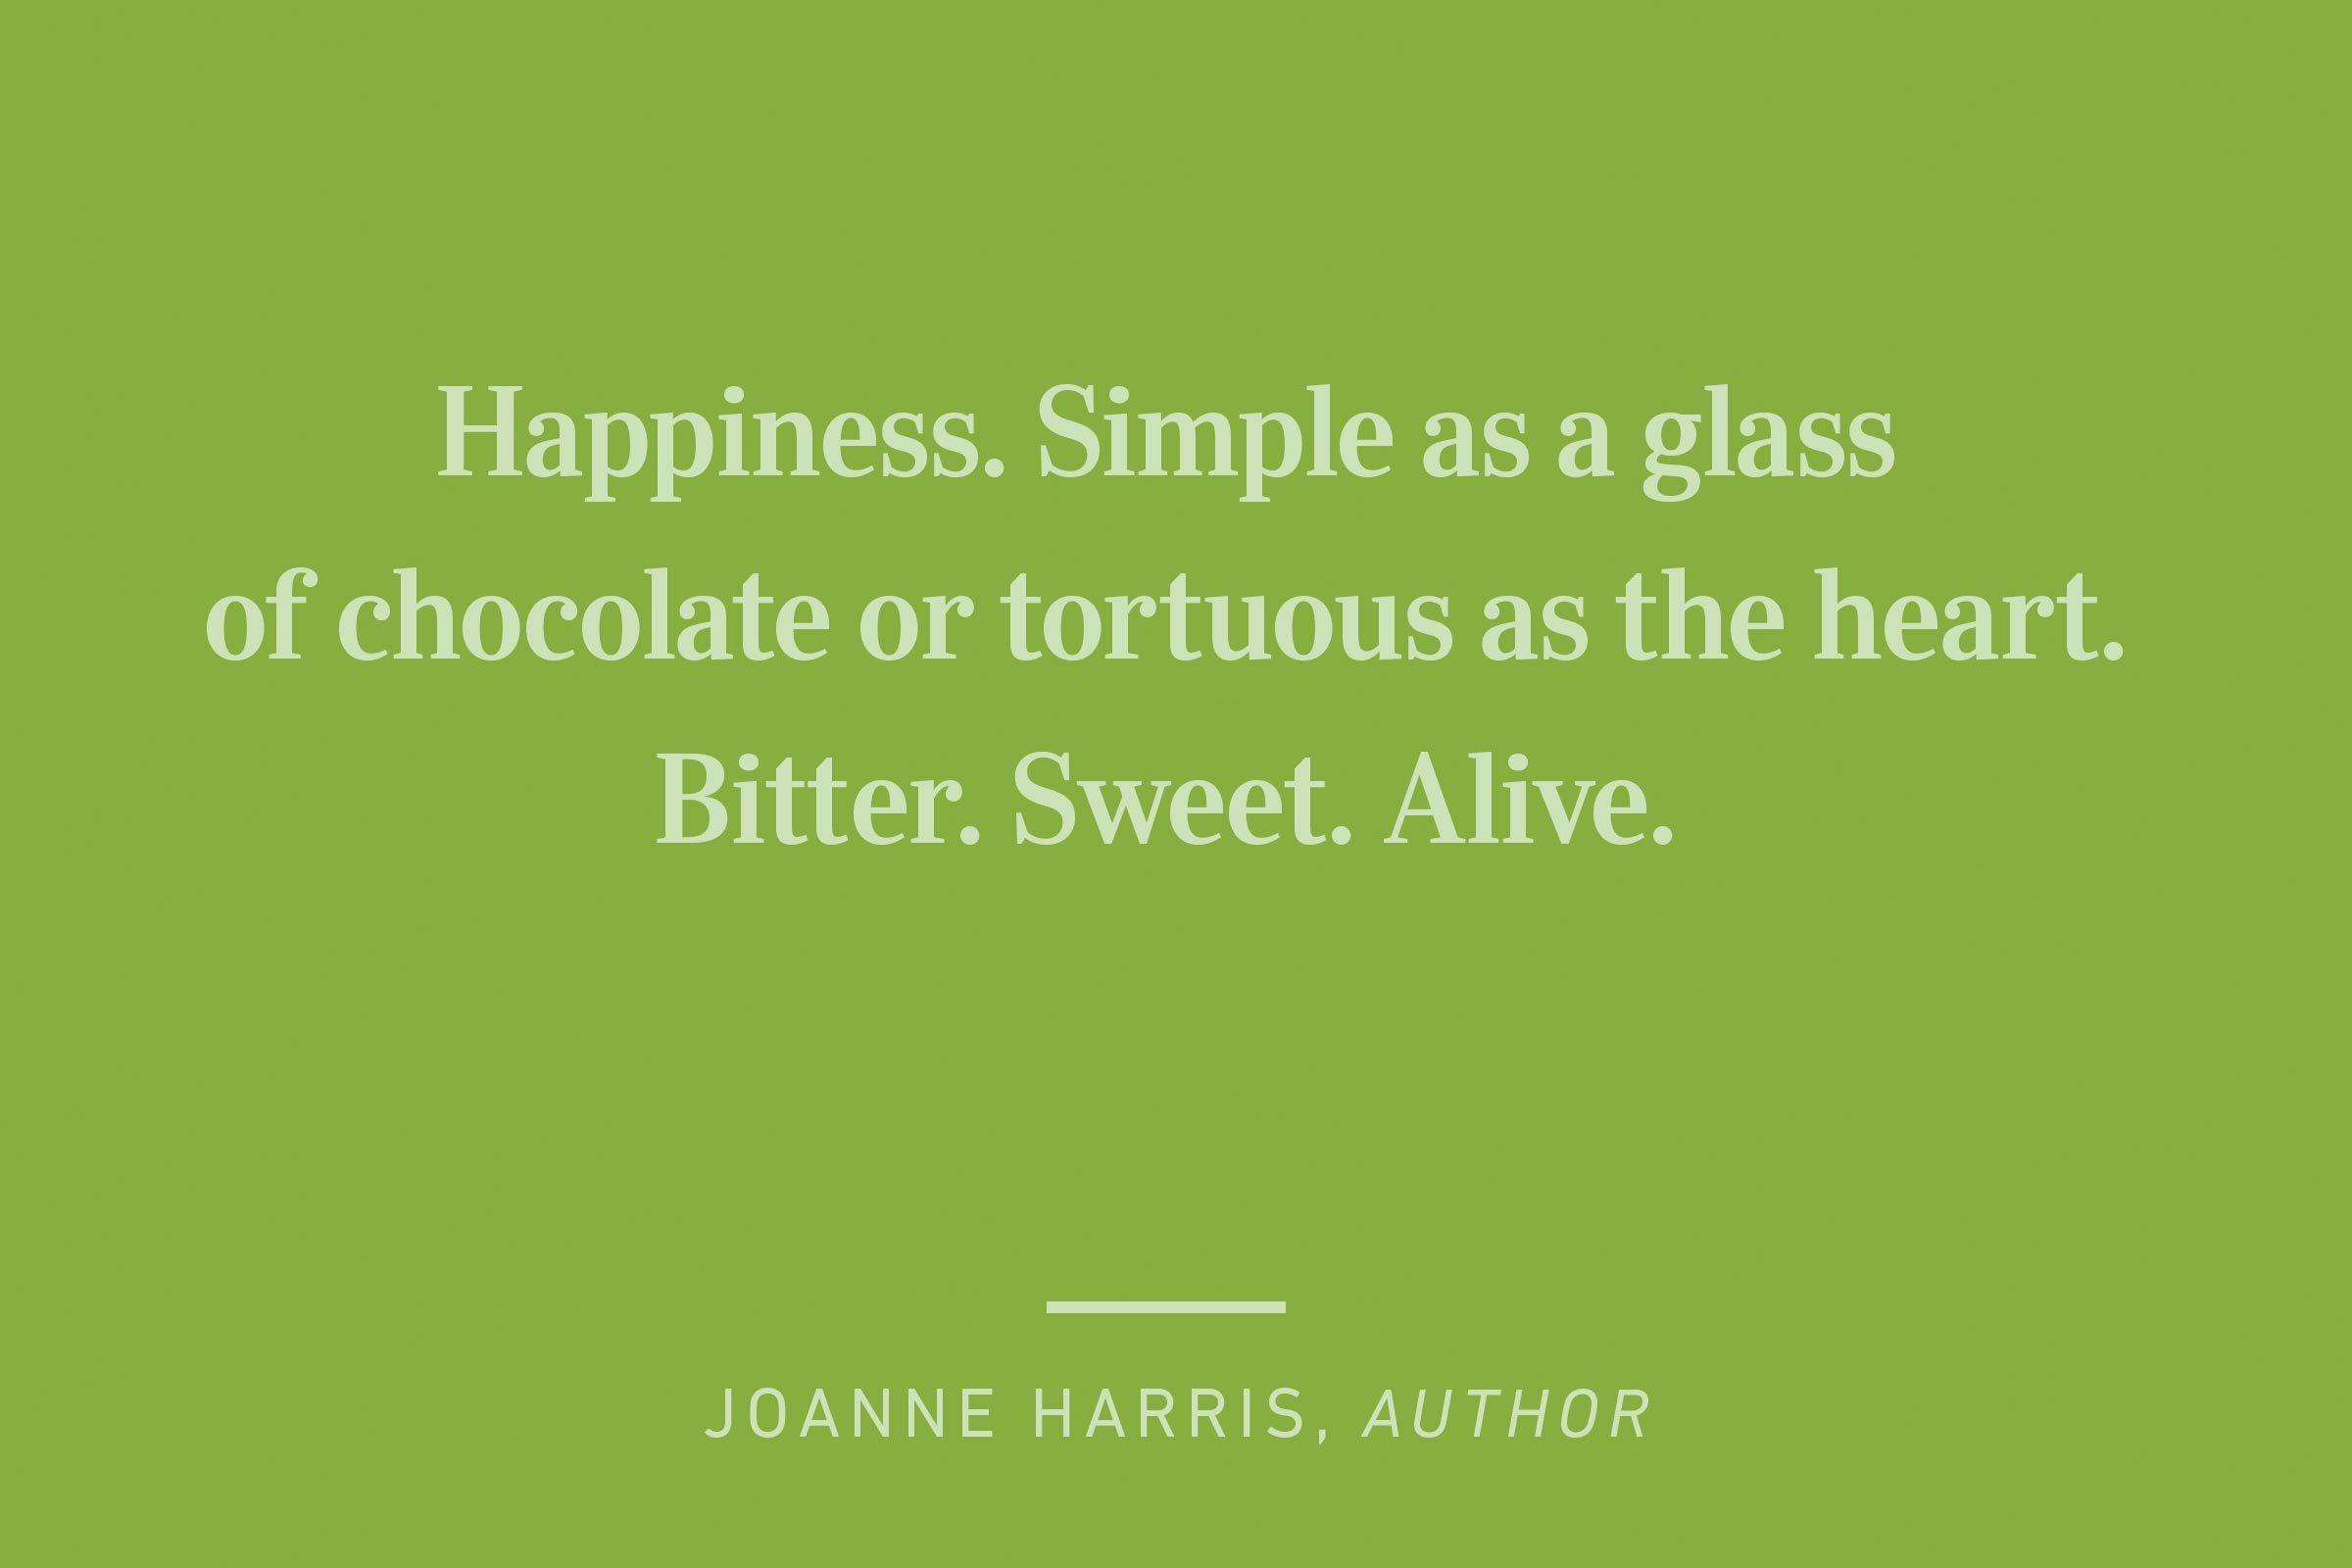 joanne harris happiness quote